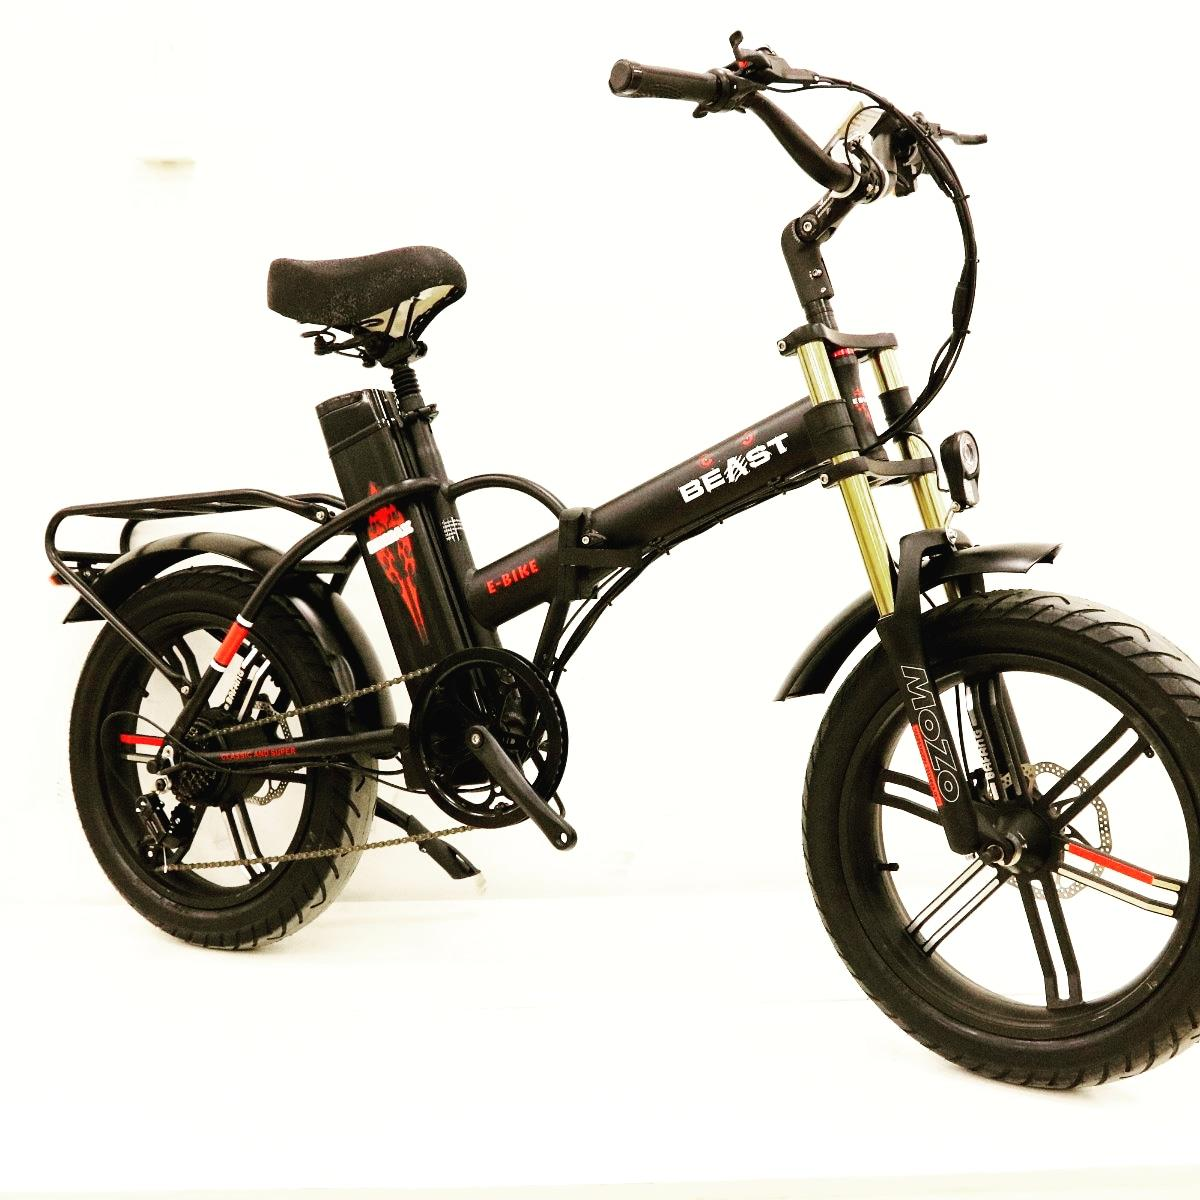 BEAST אופניים חשמליים 48V 20A מבית EBMAX